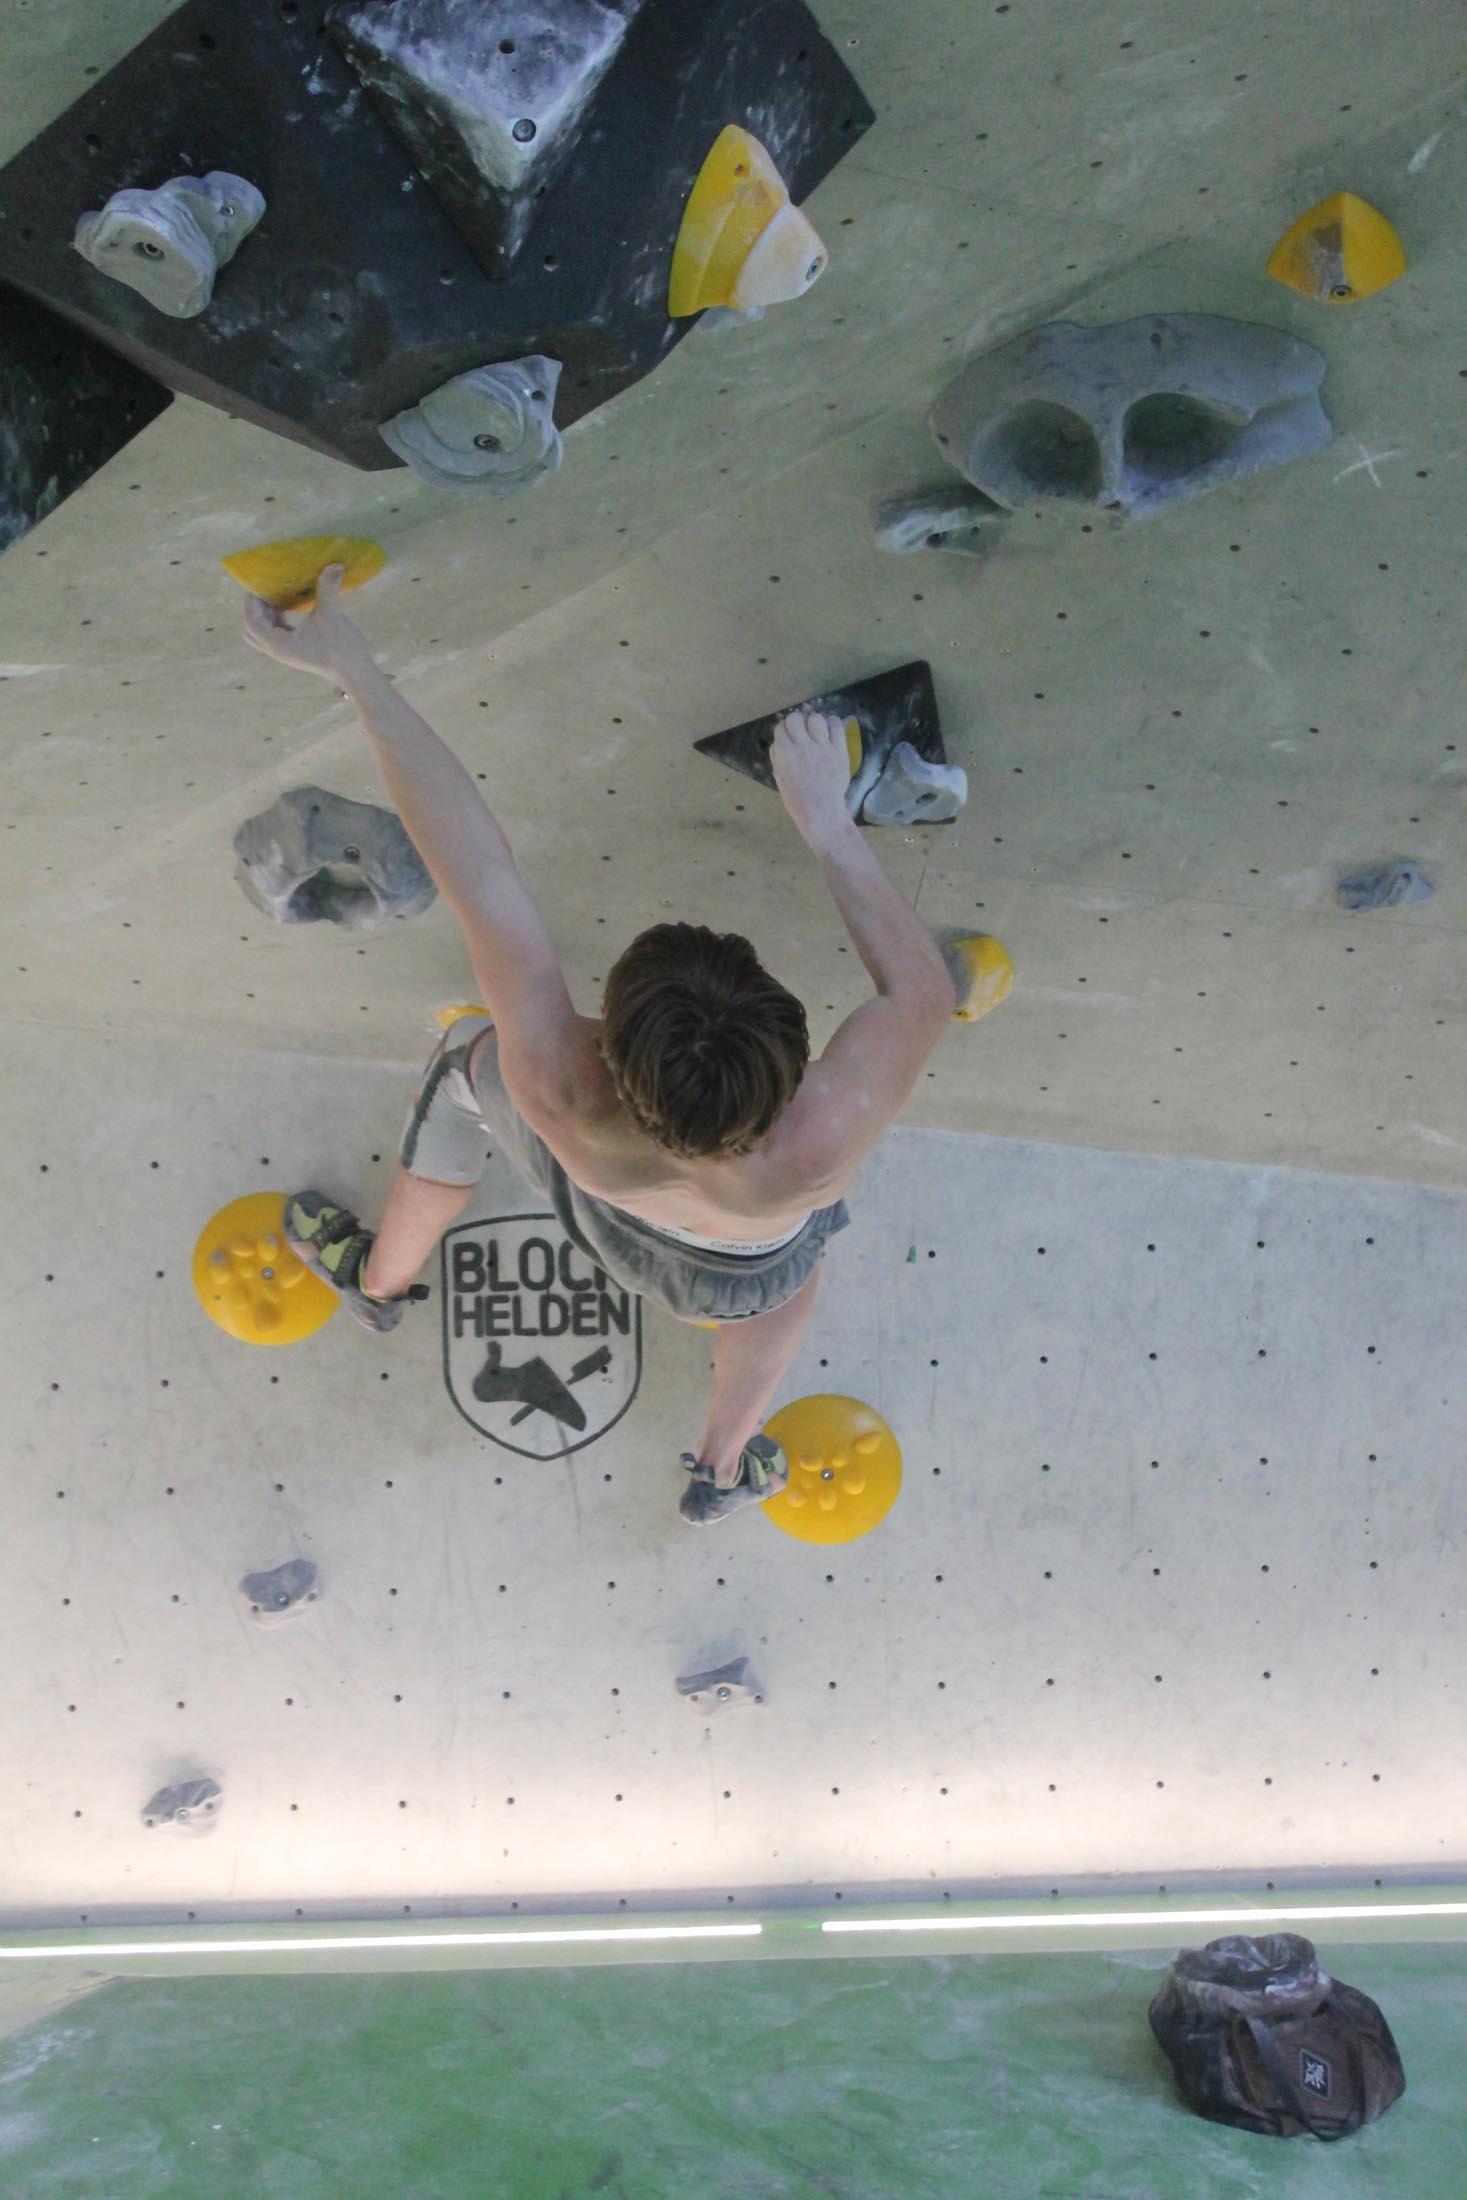 Quali, internationaler bouldercup Frankenjura 2016, BLOCKHELDEN Erlangen, Mammut, Bergfreunde.de, Boulderwettkampf07092016269